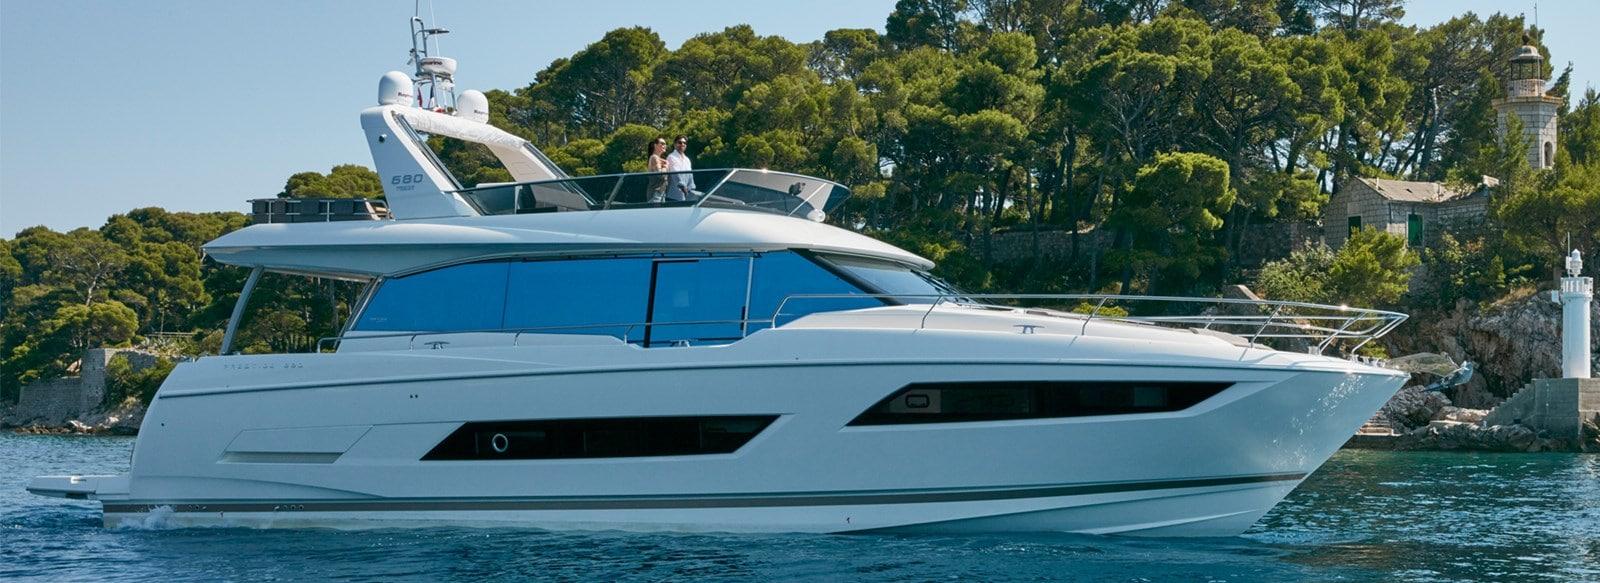 new prestige 680 yacht for sale